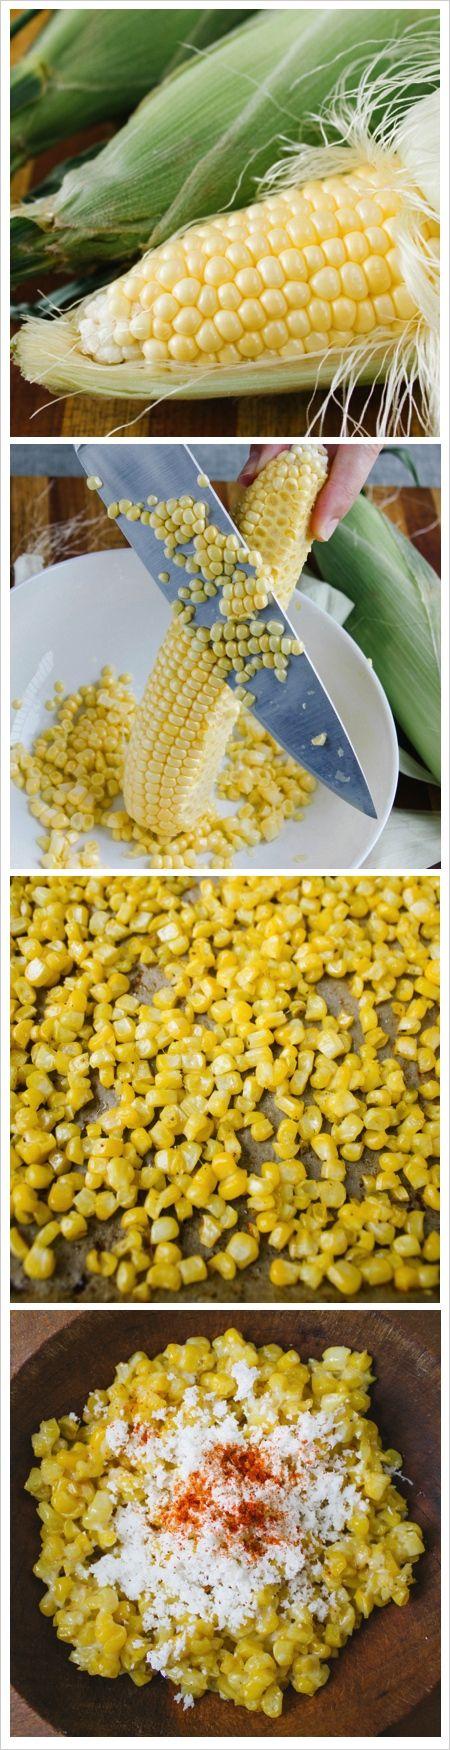 How To Roast Corn Off The Cob